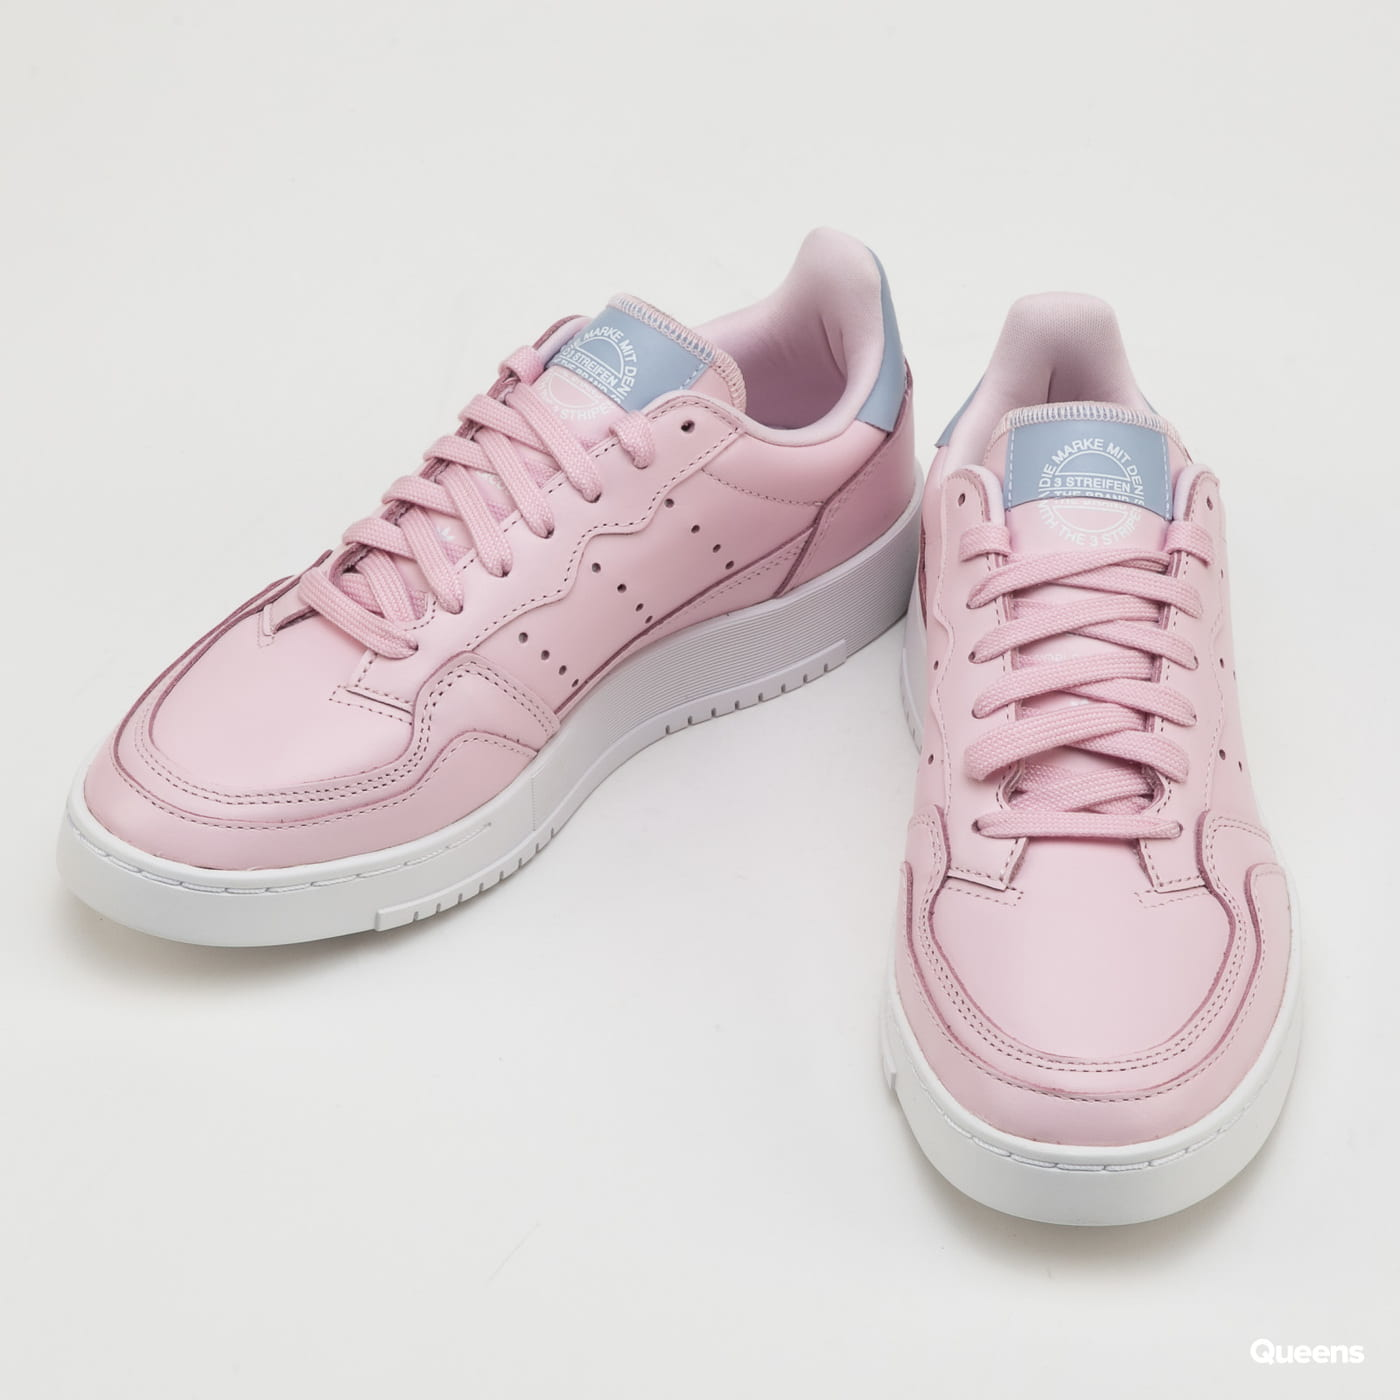 adidas Originals Supercourt W clpink / aerblu / ftwwht